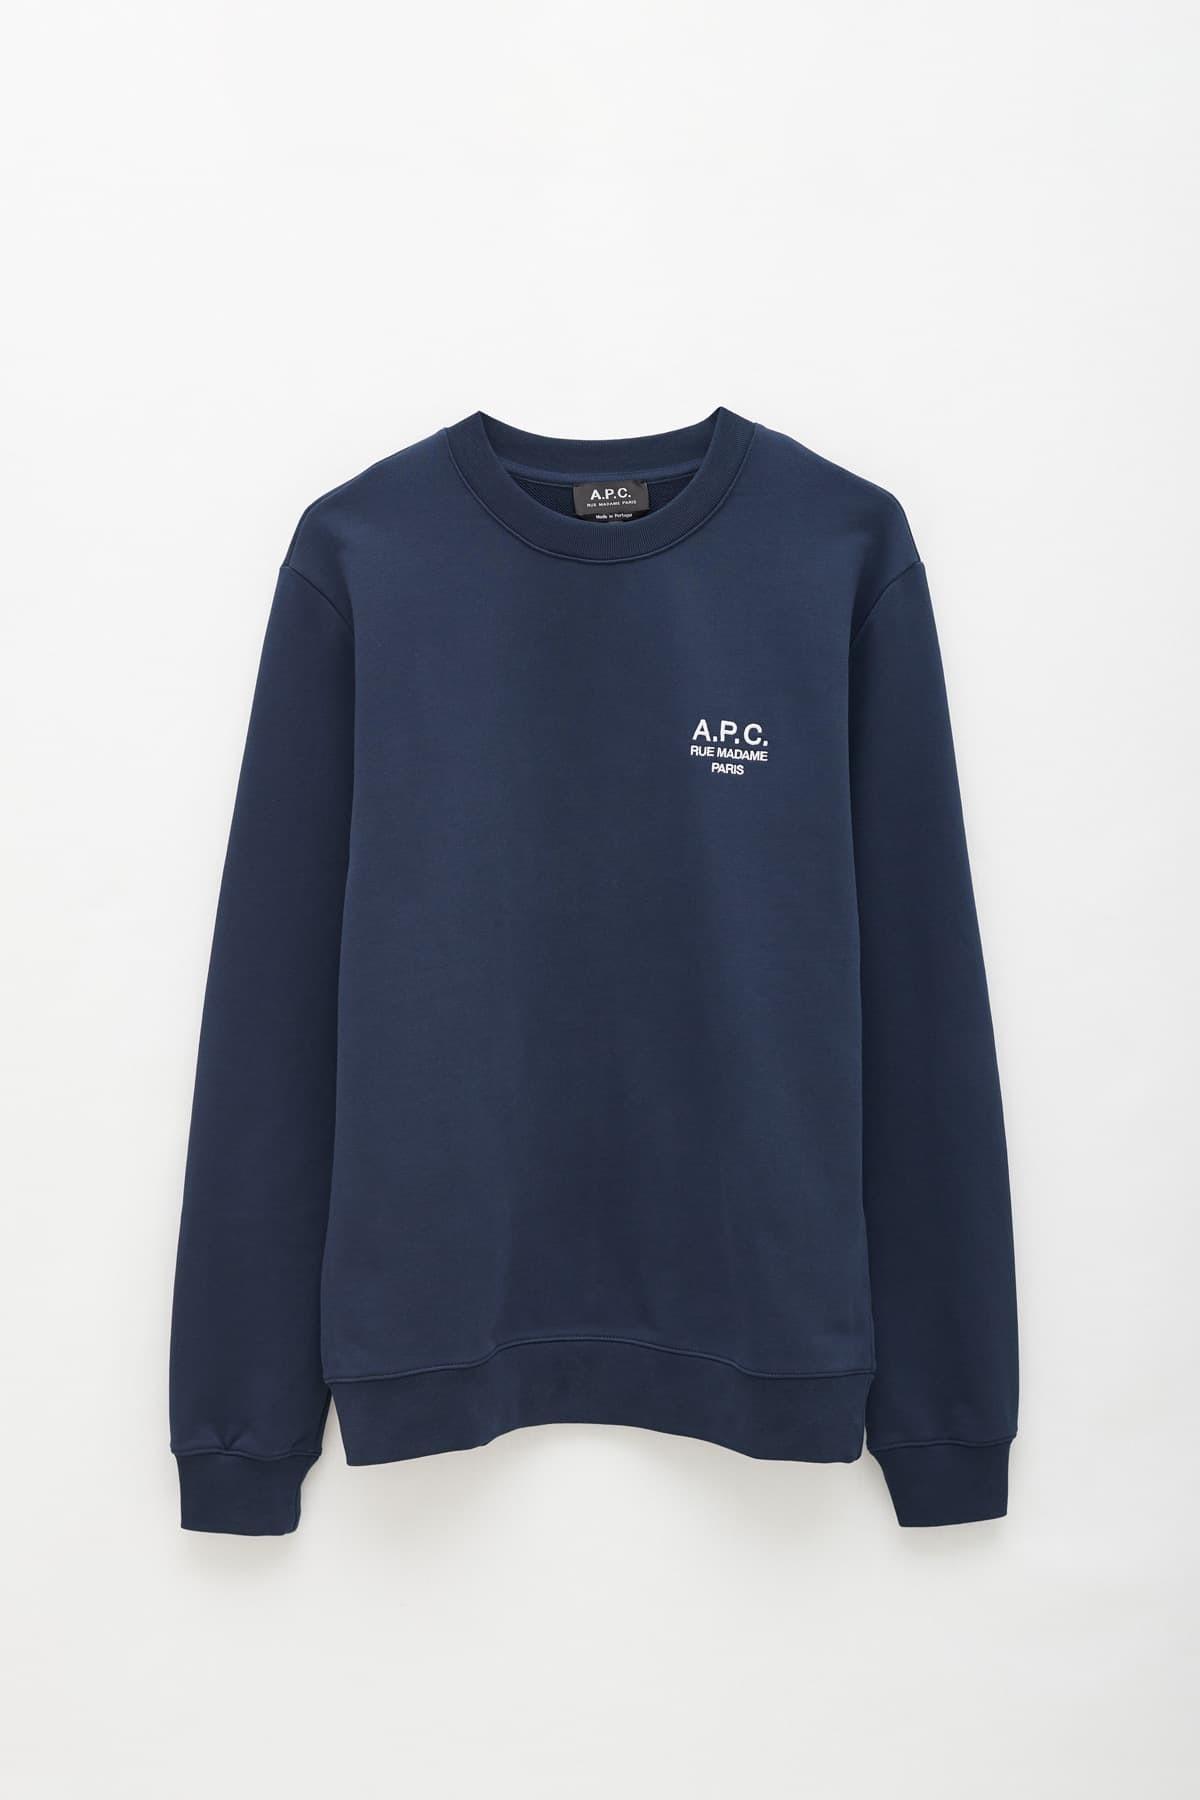 Shop Comme Des Garcons Play x Converse Blue Chuck Taylor 70 High Sneakers